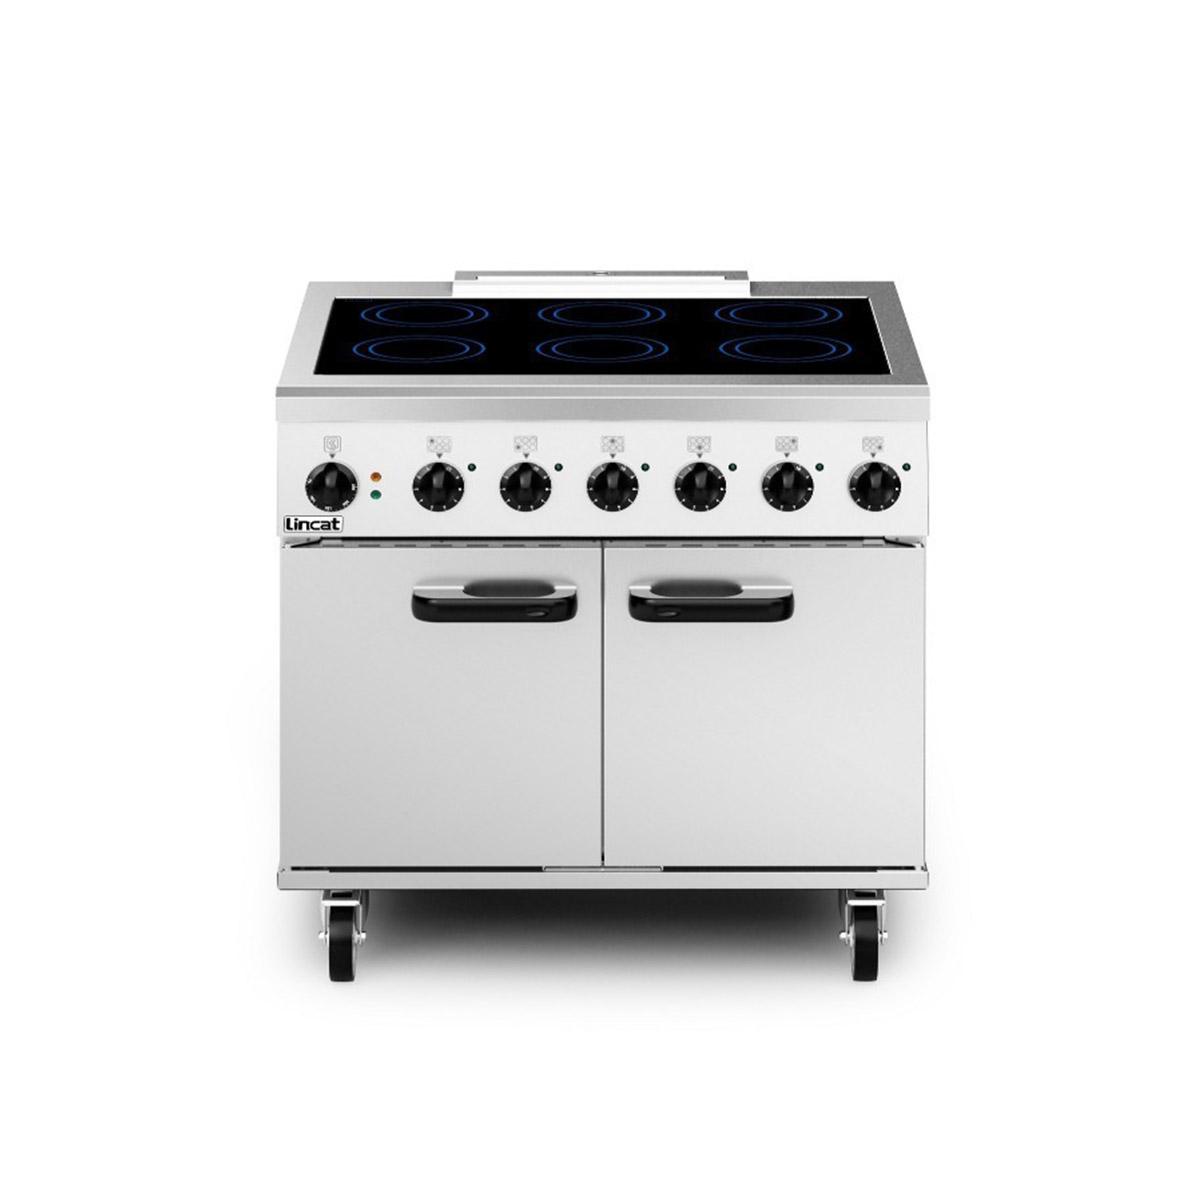 Lincat Phoenix Induction Oven Range Model: PHER01/SPH